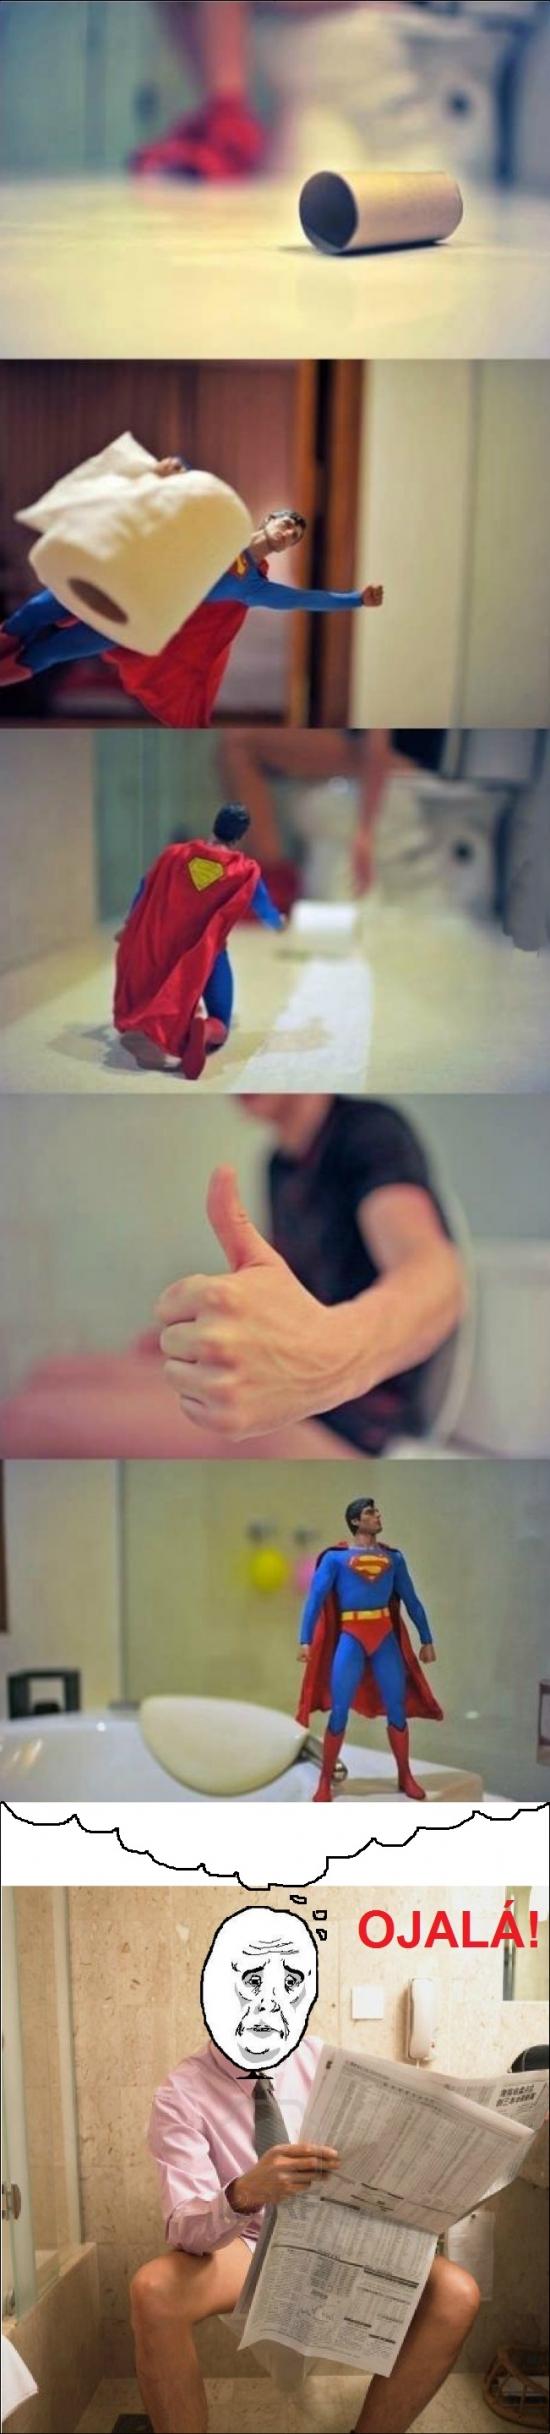 baño,cagar,higienico,muñeco,ojalá,okay,papel,superman